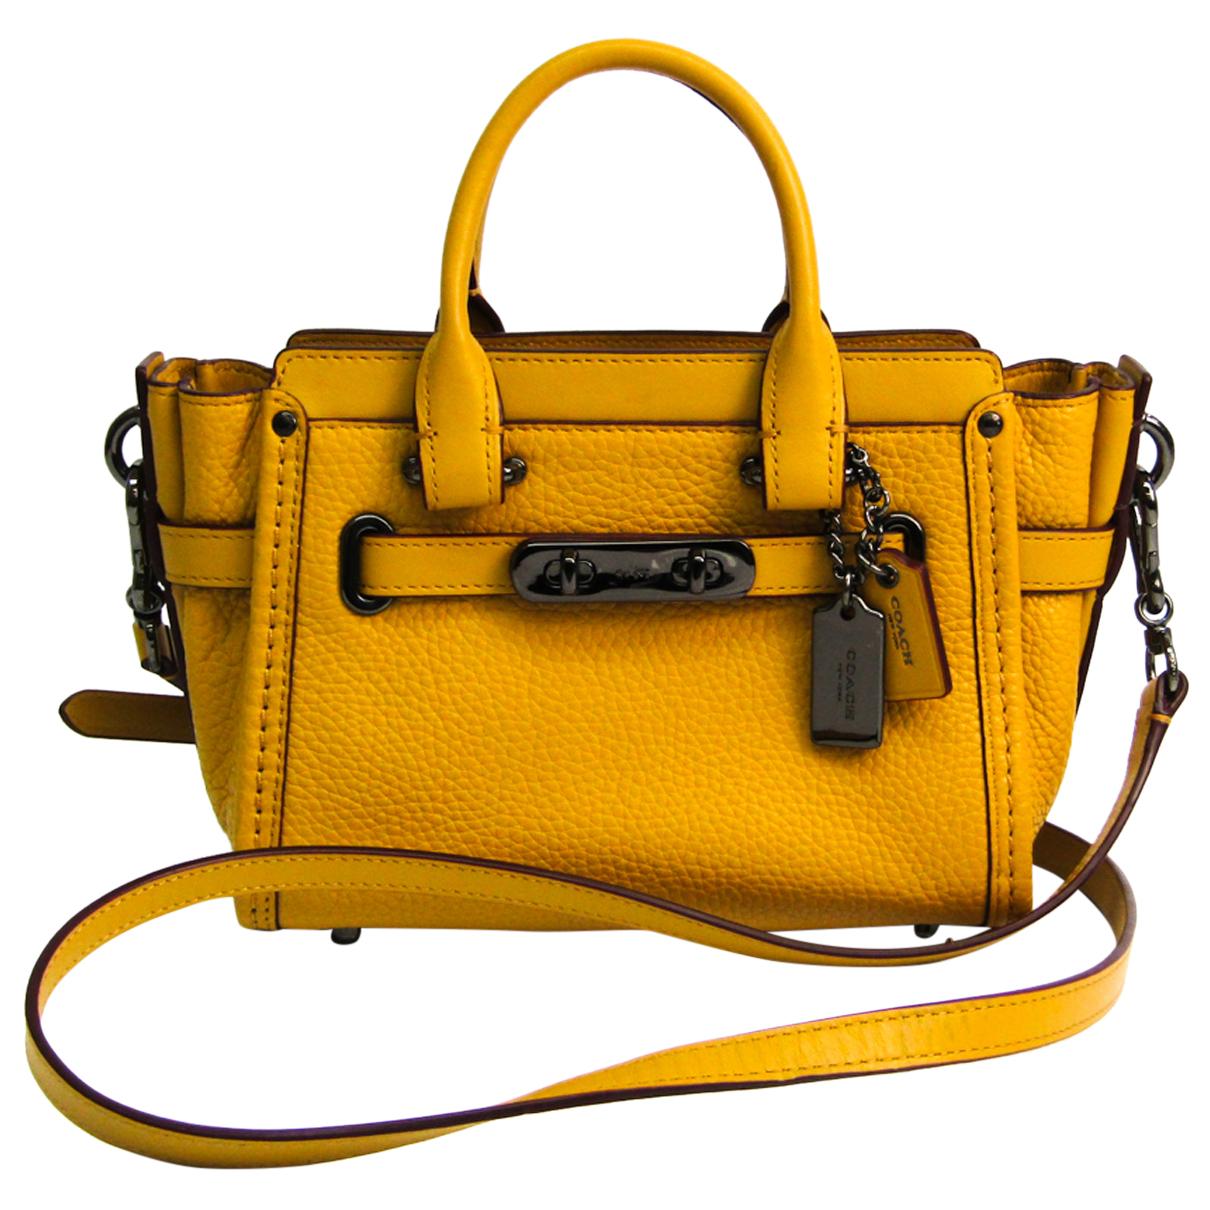 Coach - Sac a main   pour femme en cuir - jaune